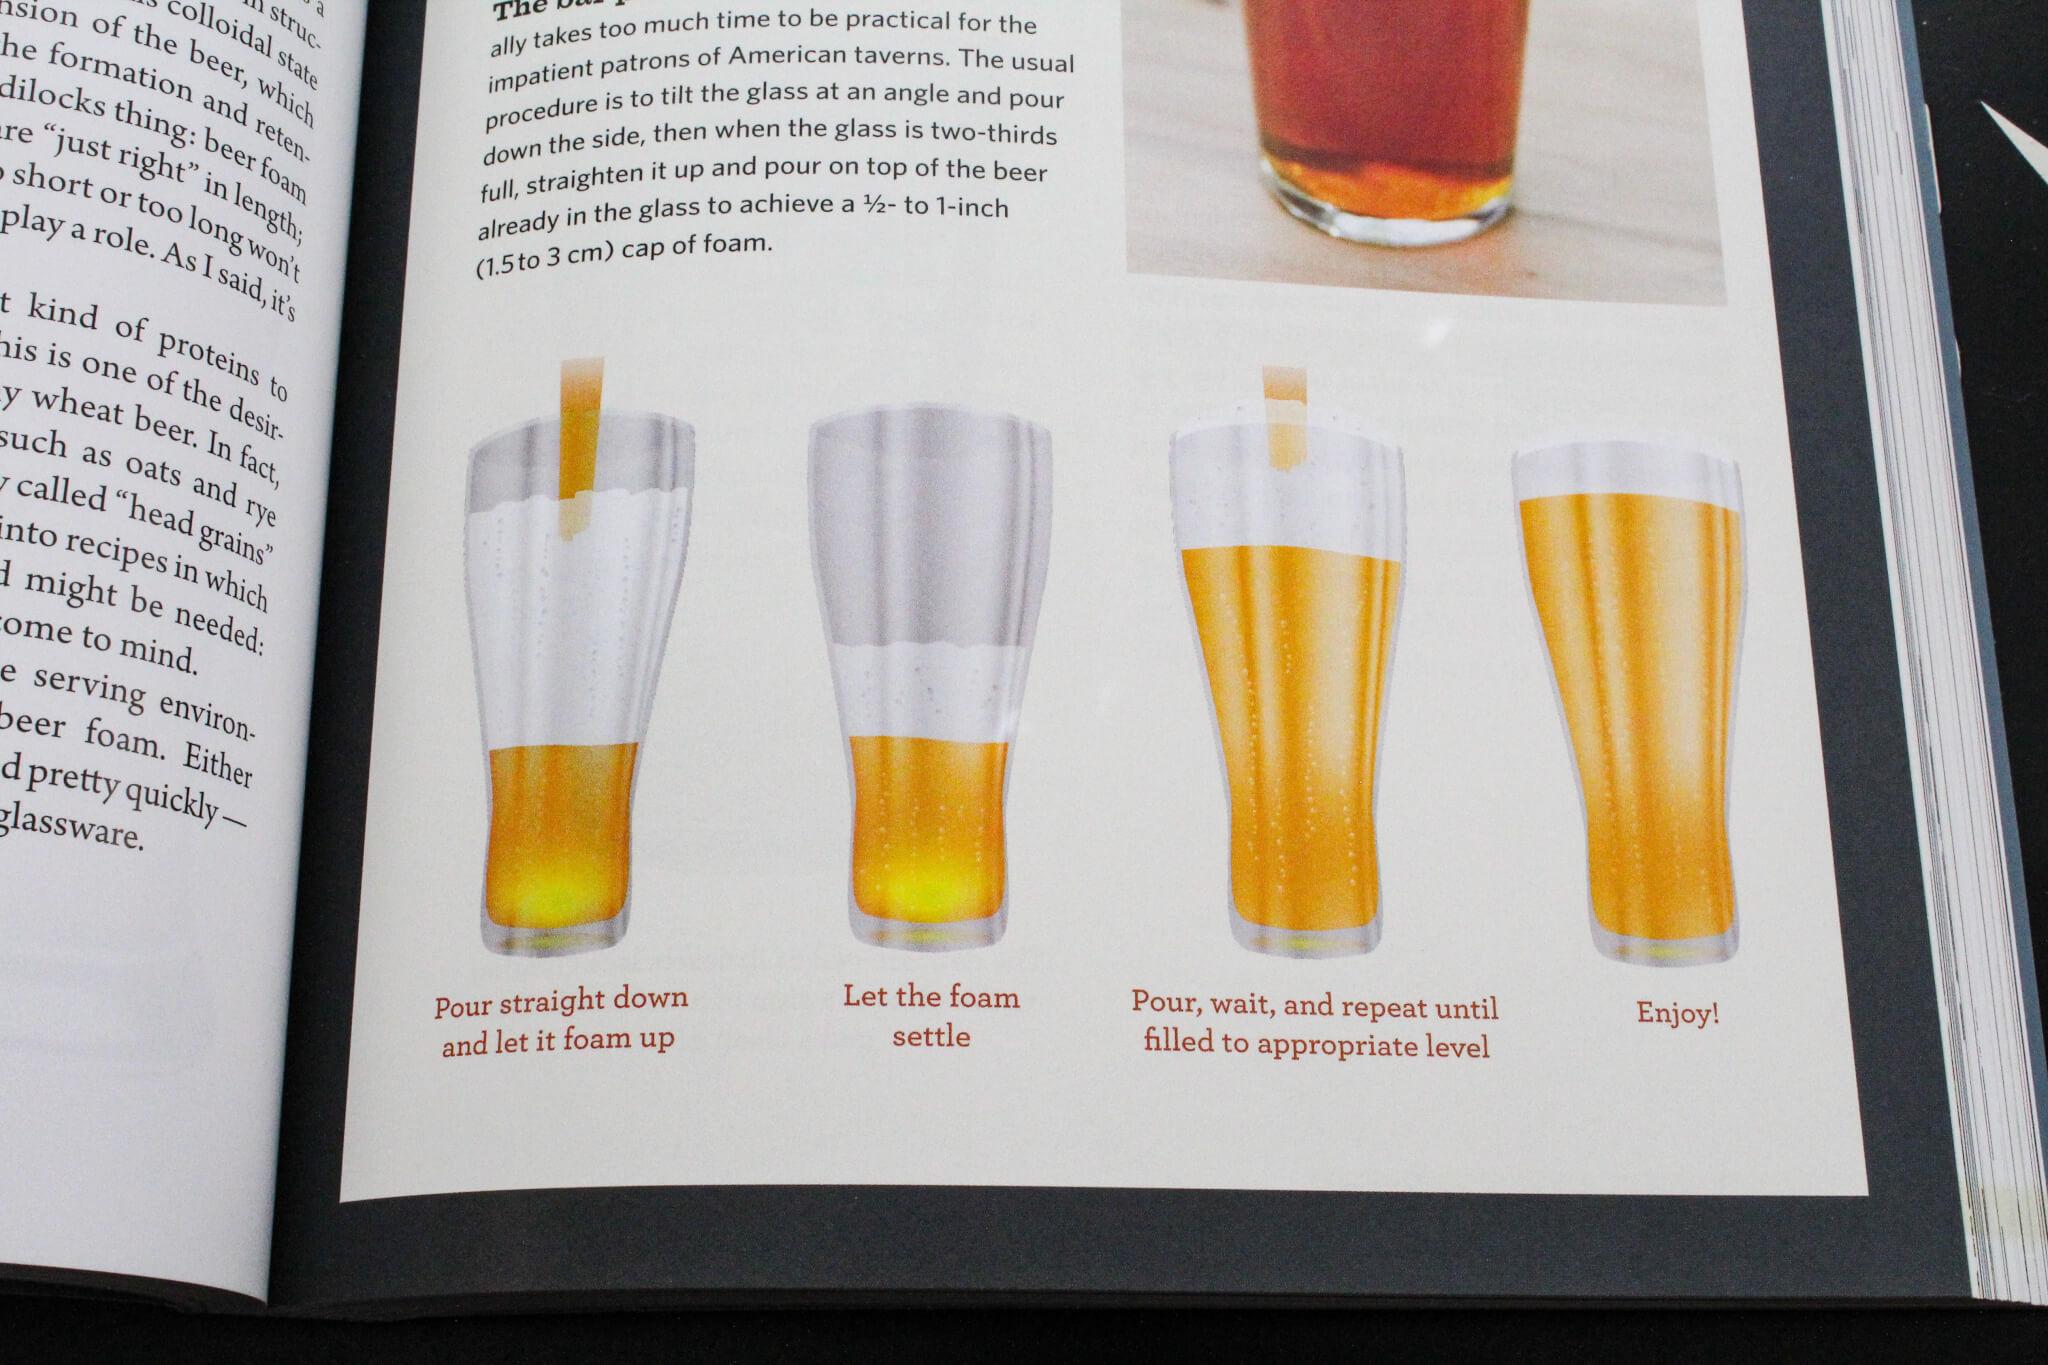 Способы налива пива